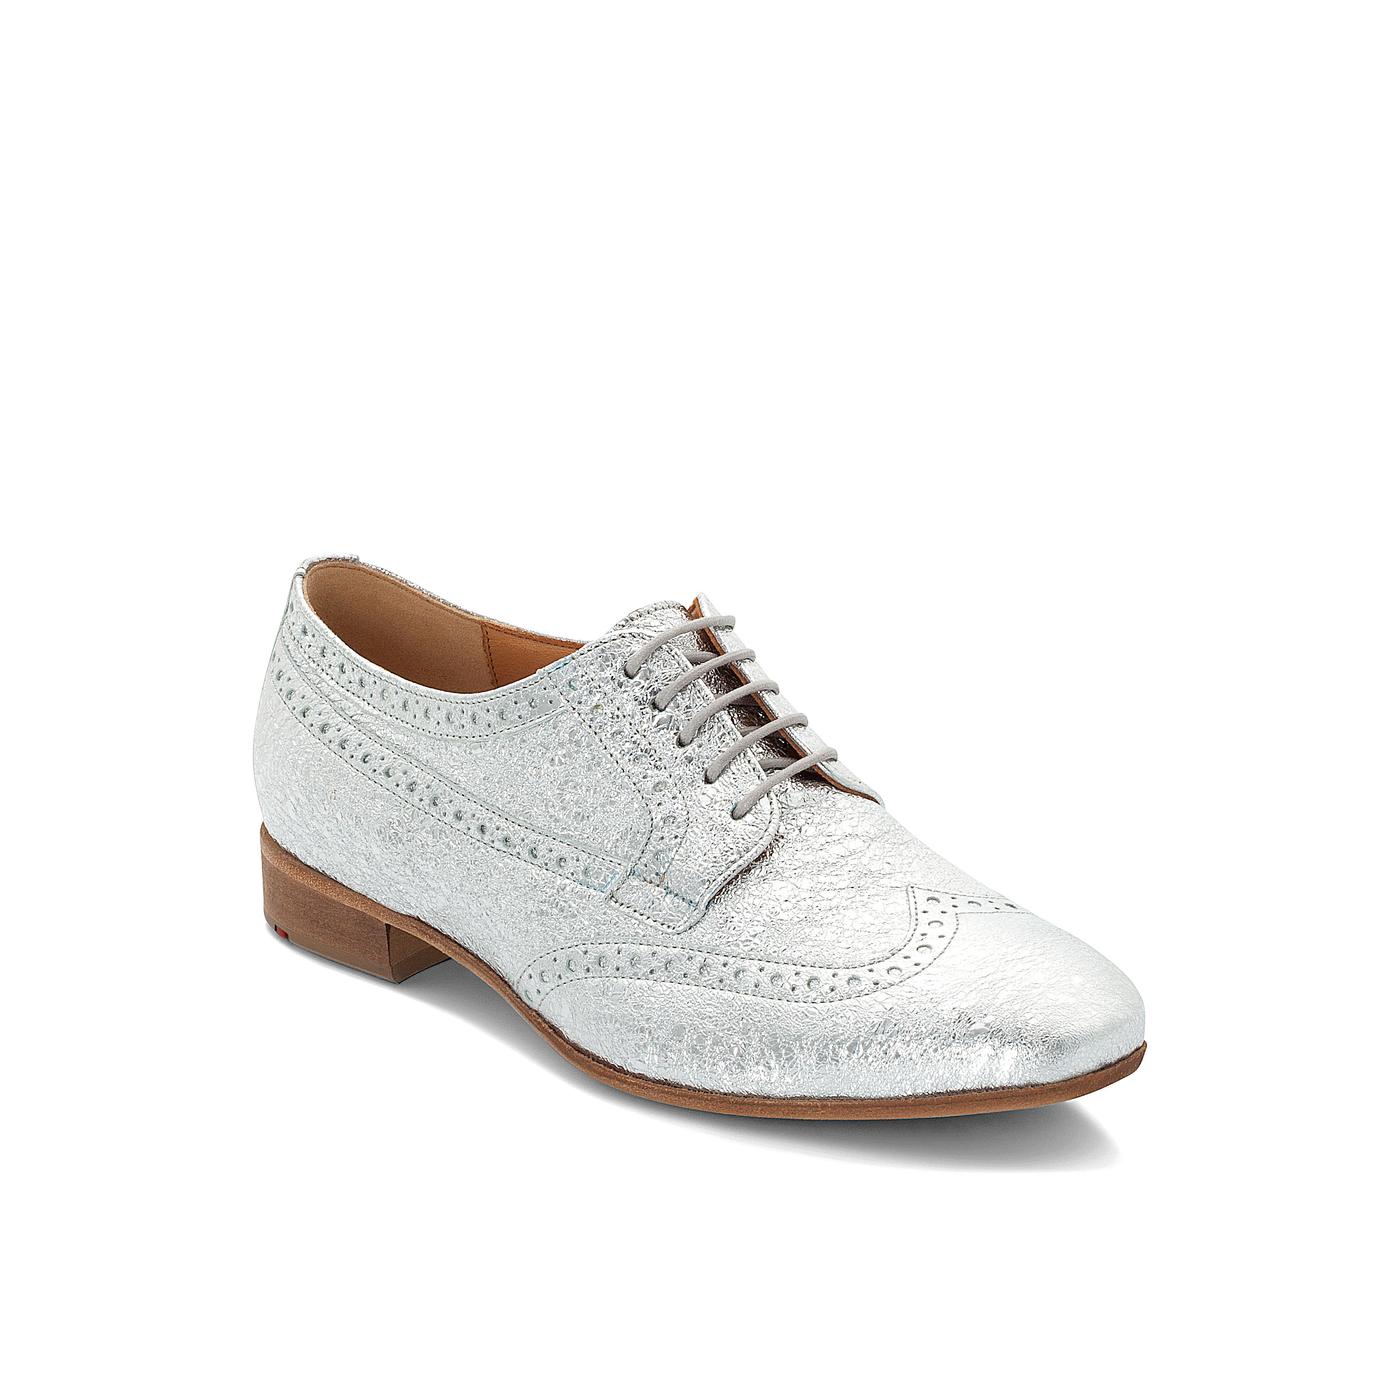 Halbschuhe | Schuhe > Boots | Silber | Glattleder -  leder | LLOYD